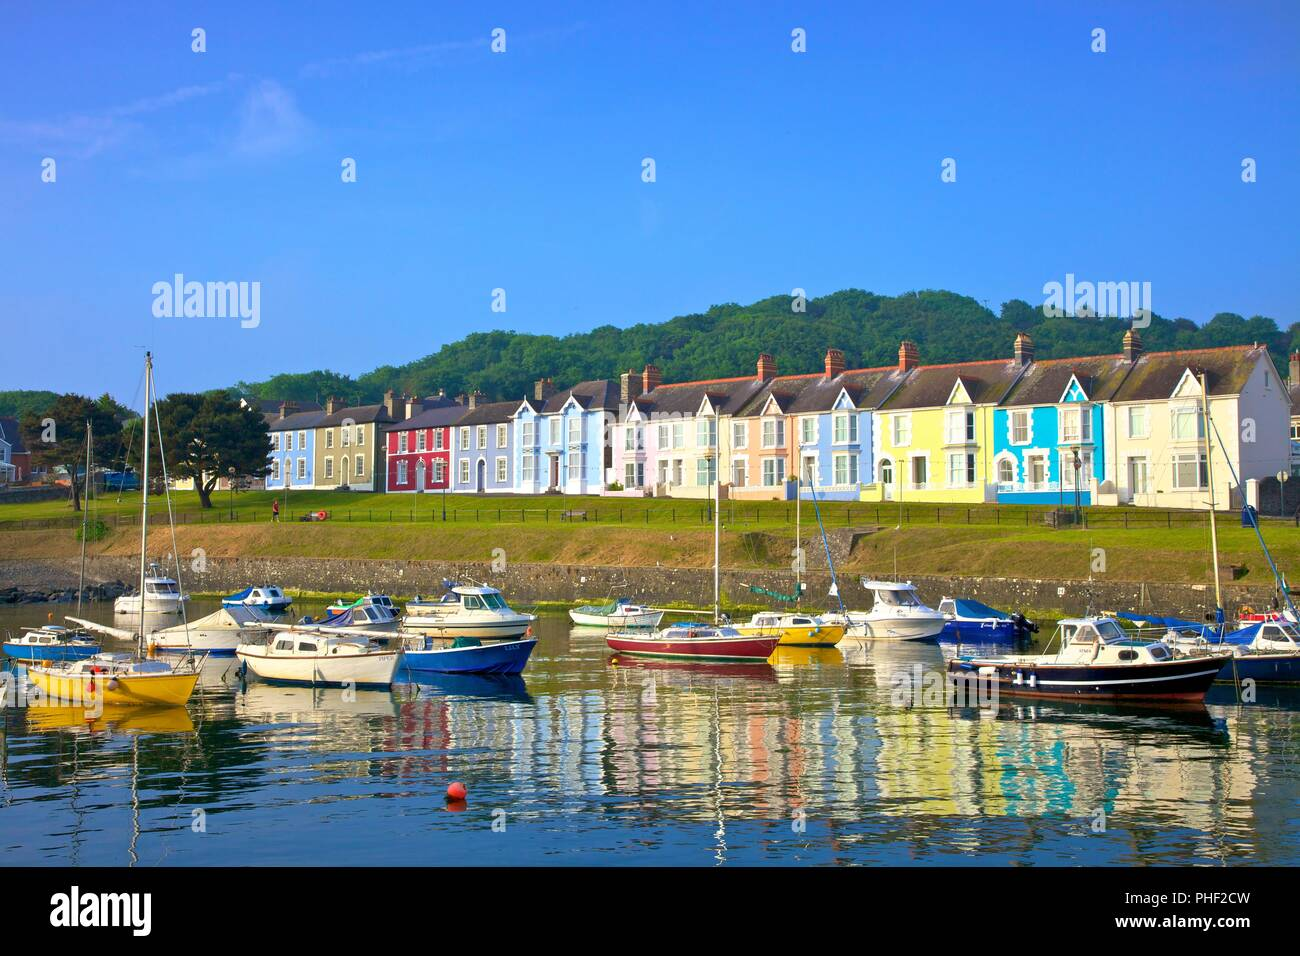 The Harbour at Aberaeron, Cardigan Bay, Wales, United Kingdom, Europe, Stock Photo